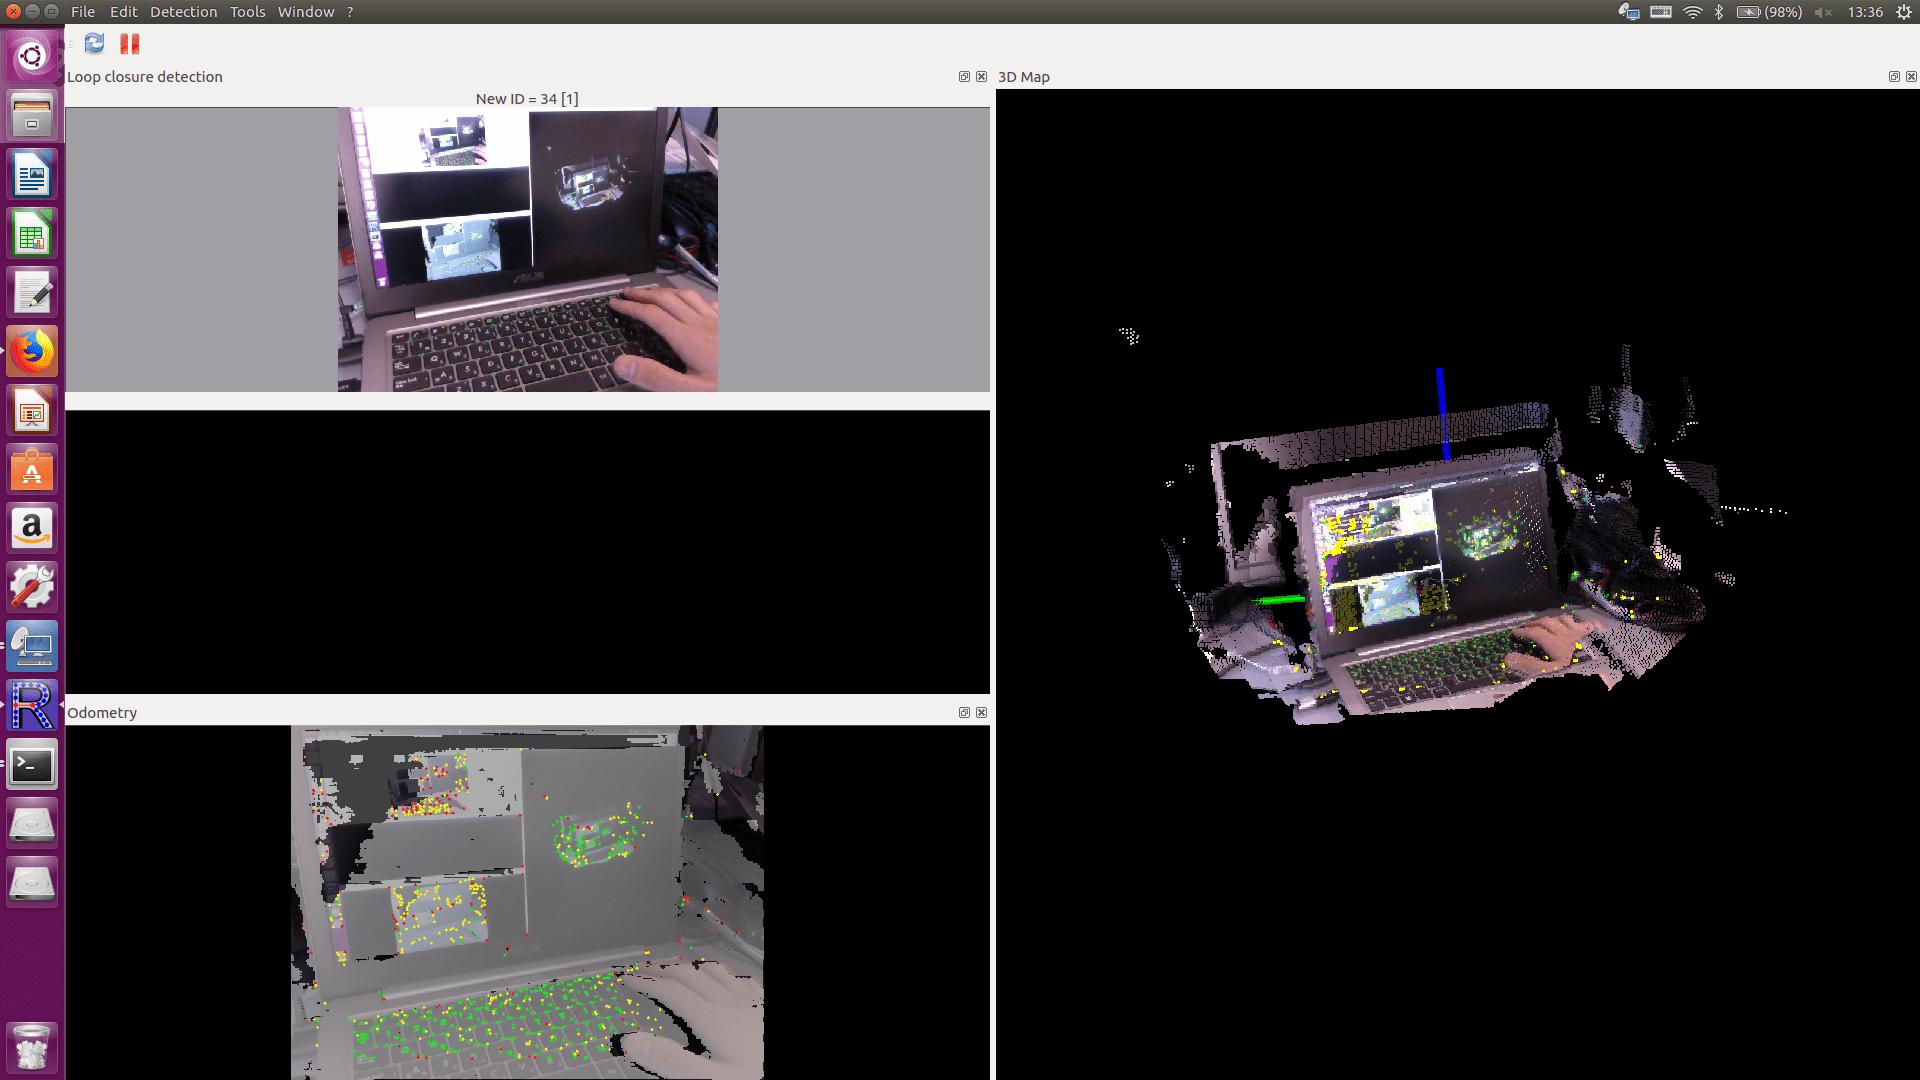 Screenshot from 2018-11-02 13-36-05-min.png